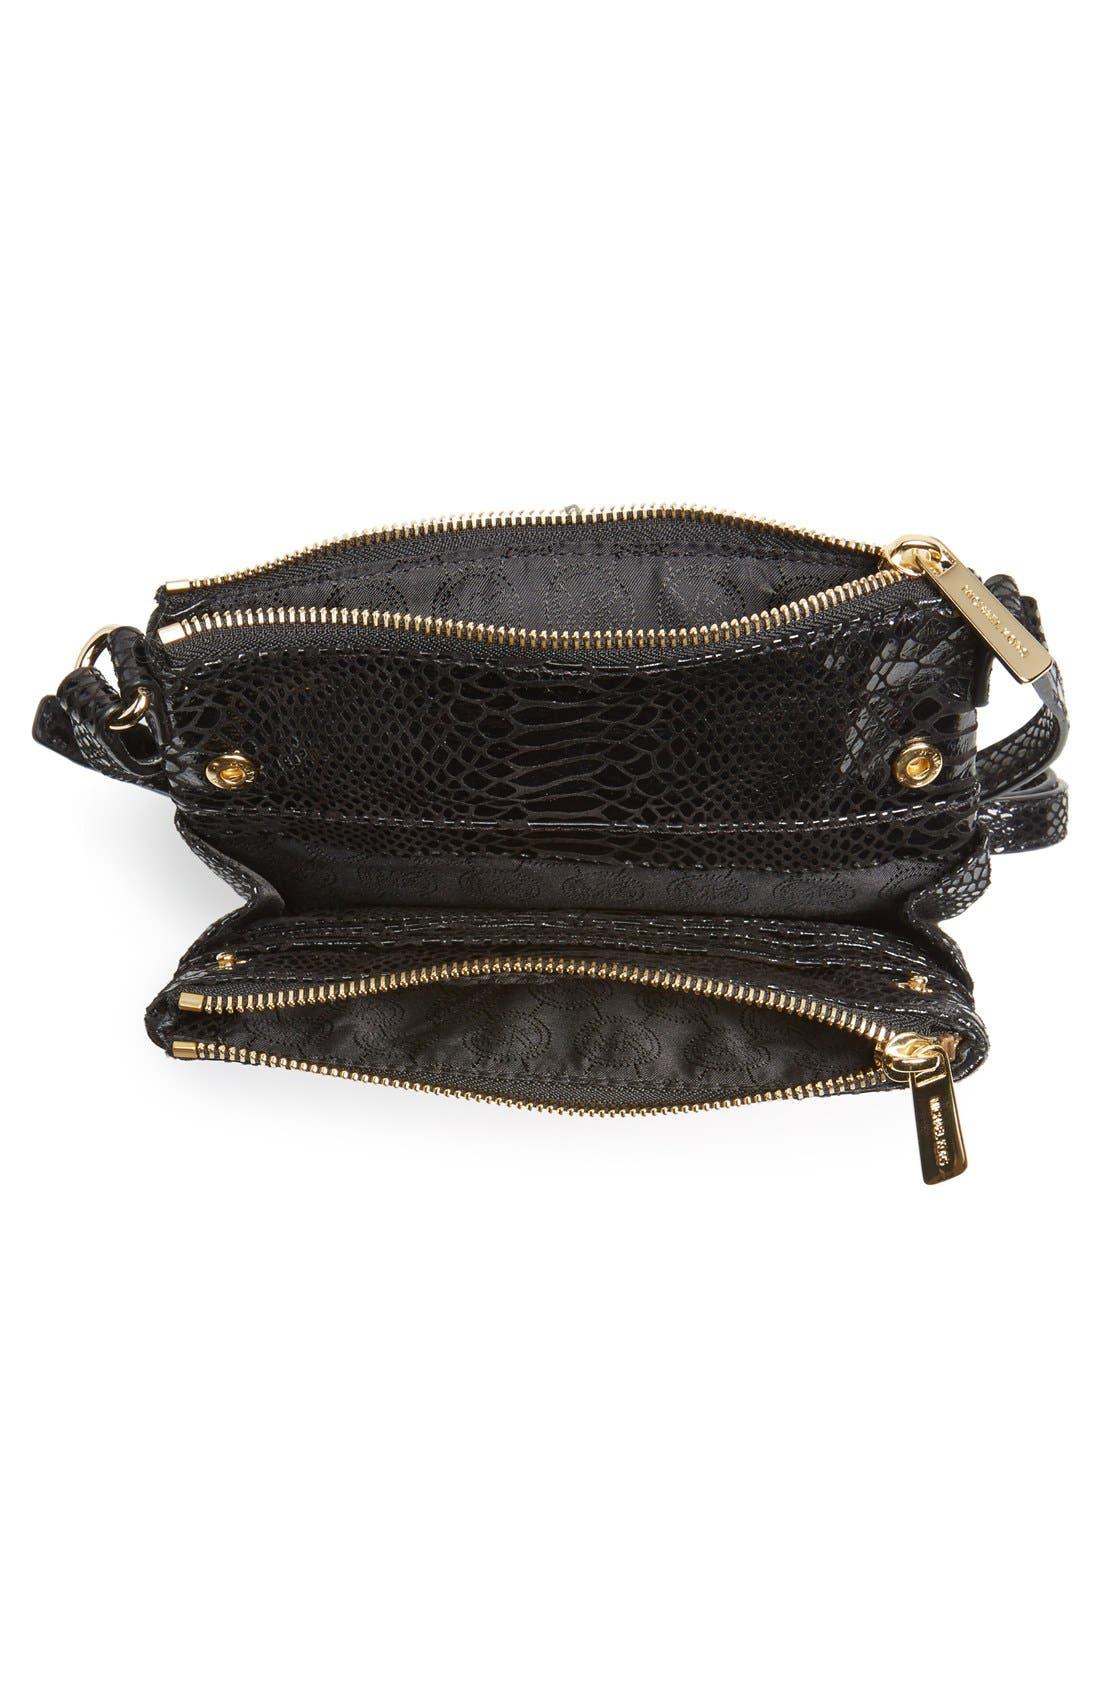 Alternate Image 3  - MICHAEL Michael Kors 'Large Fulton' Embossed Patent Crossbody Bag